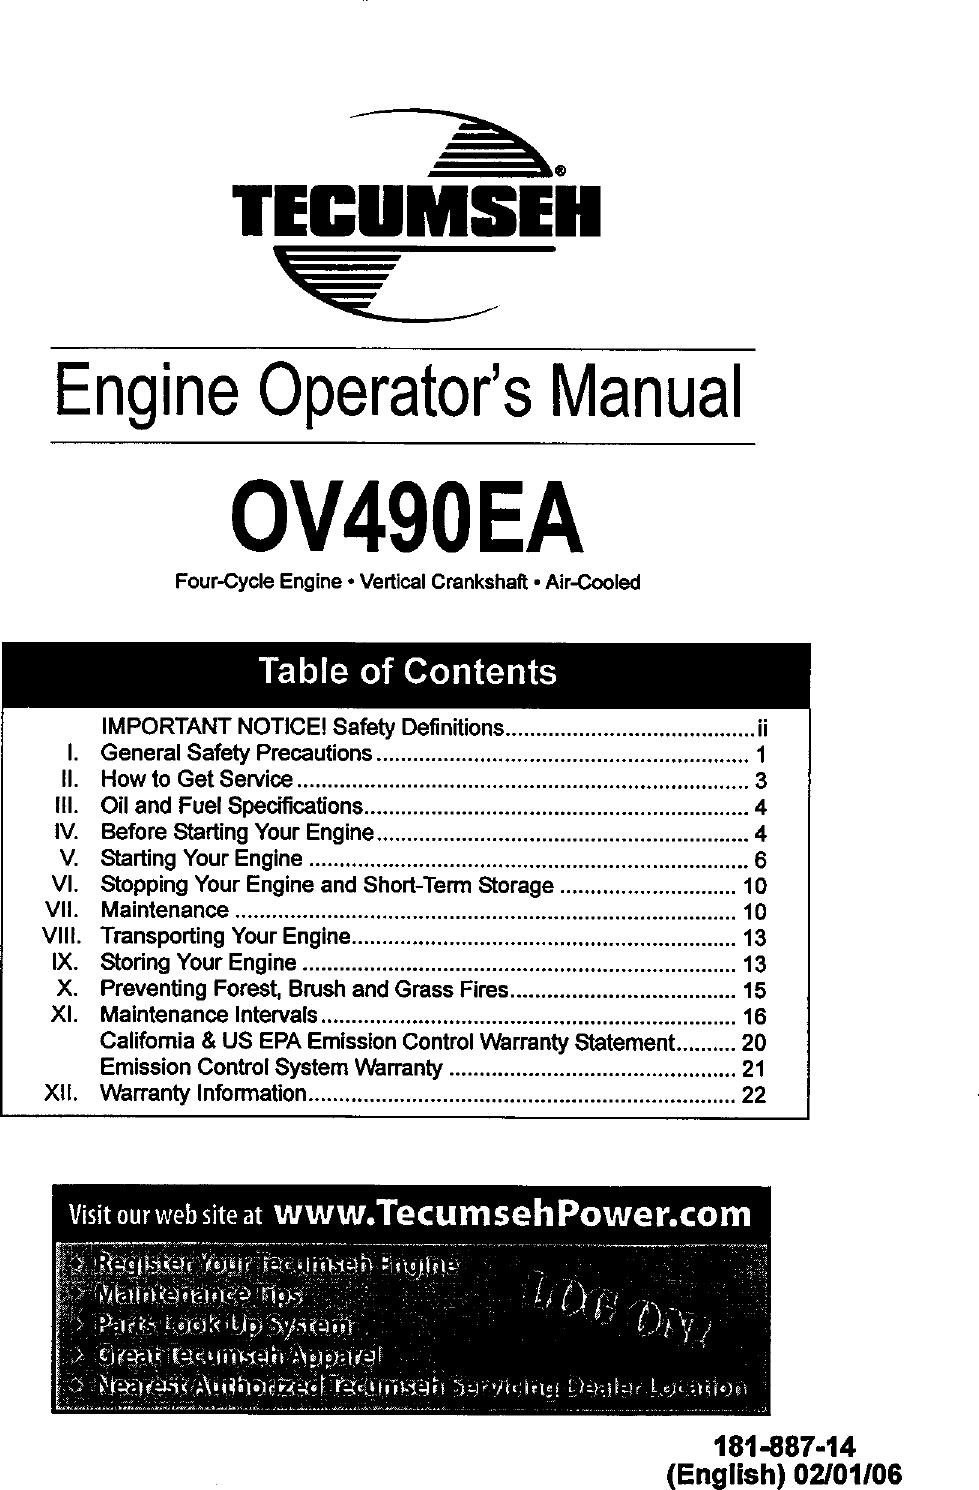 TECUMSEH Engine Manual L0611106